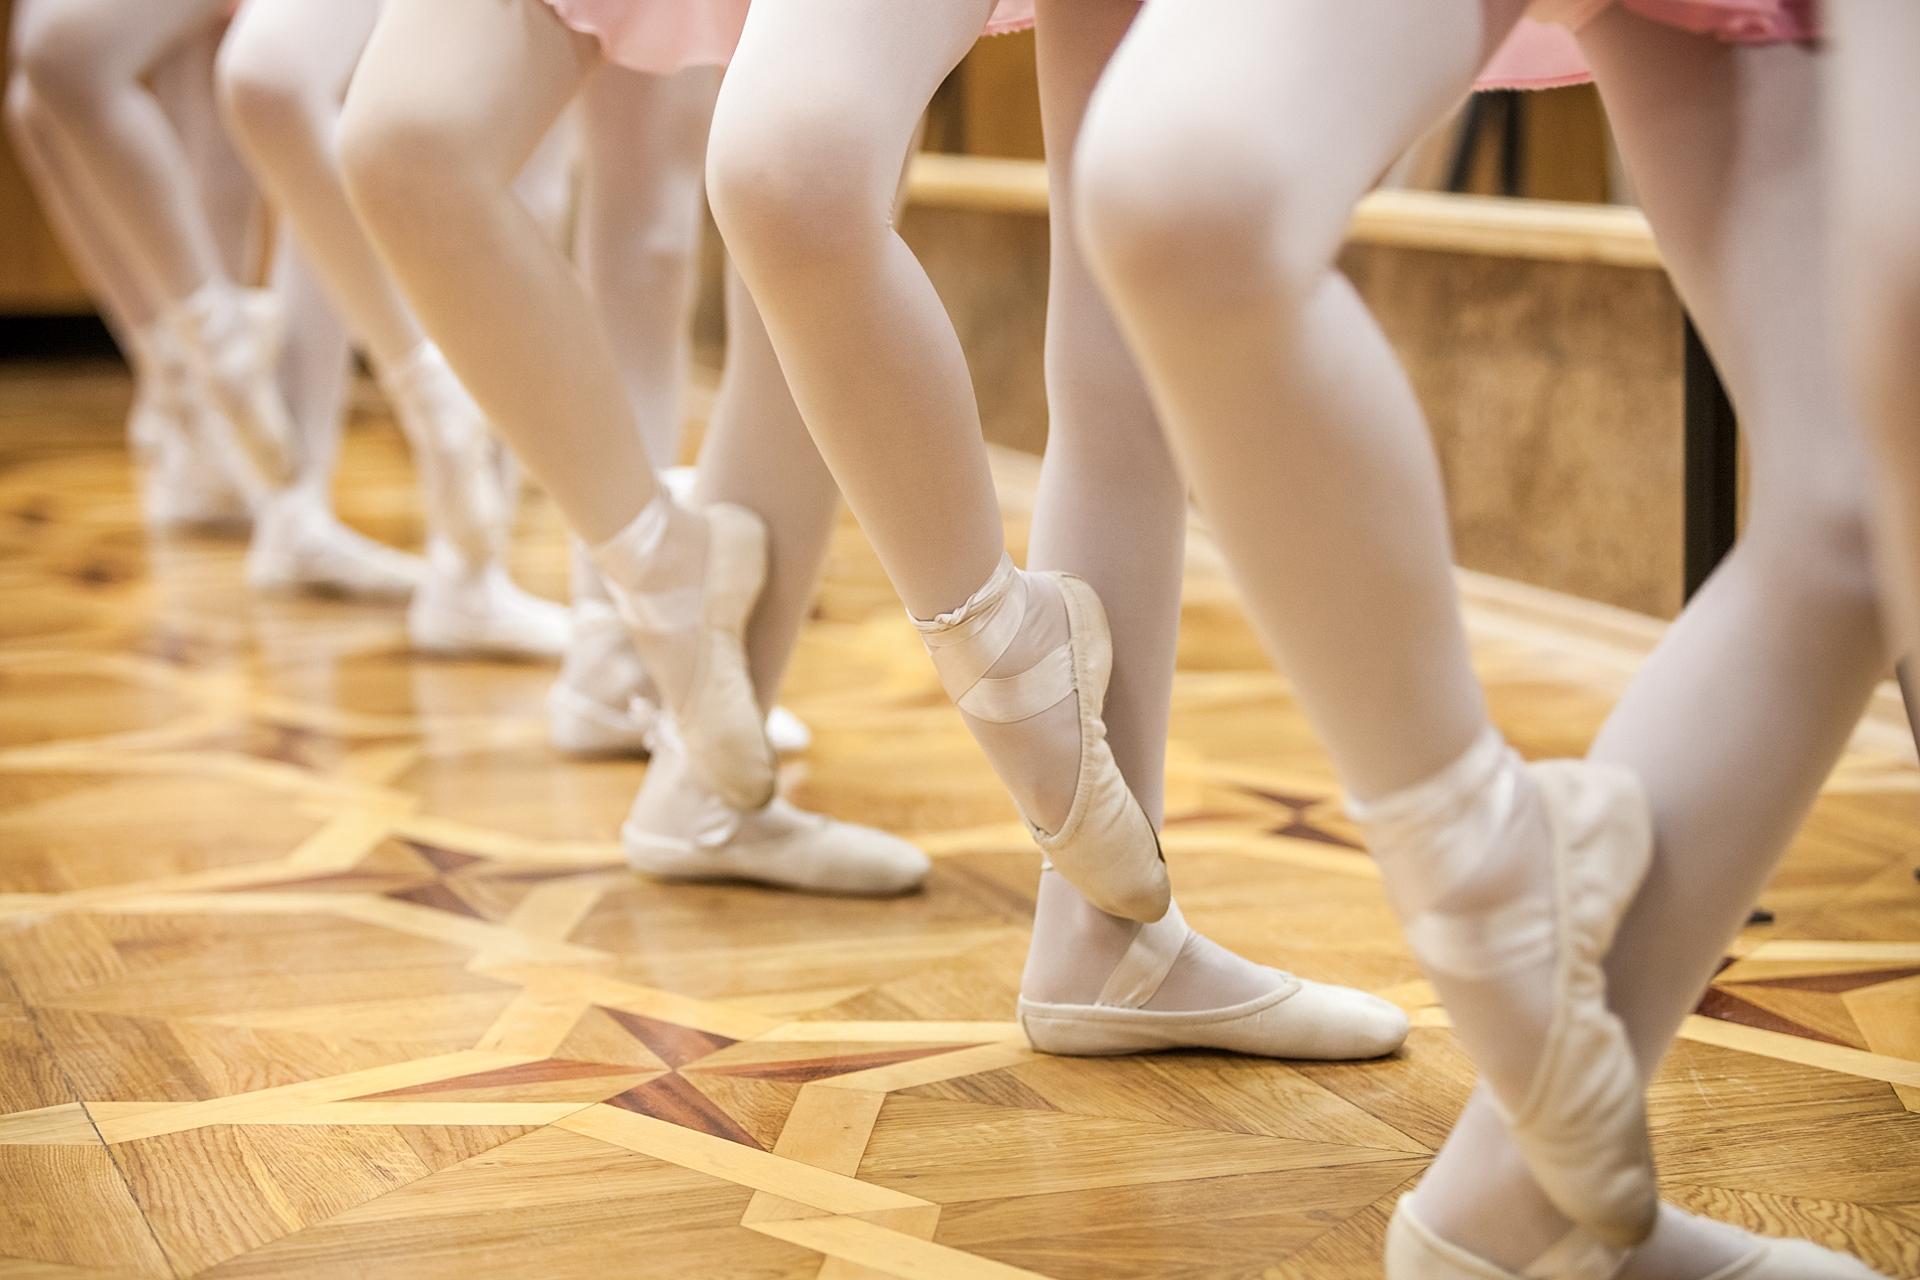 turnout in ballet